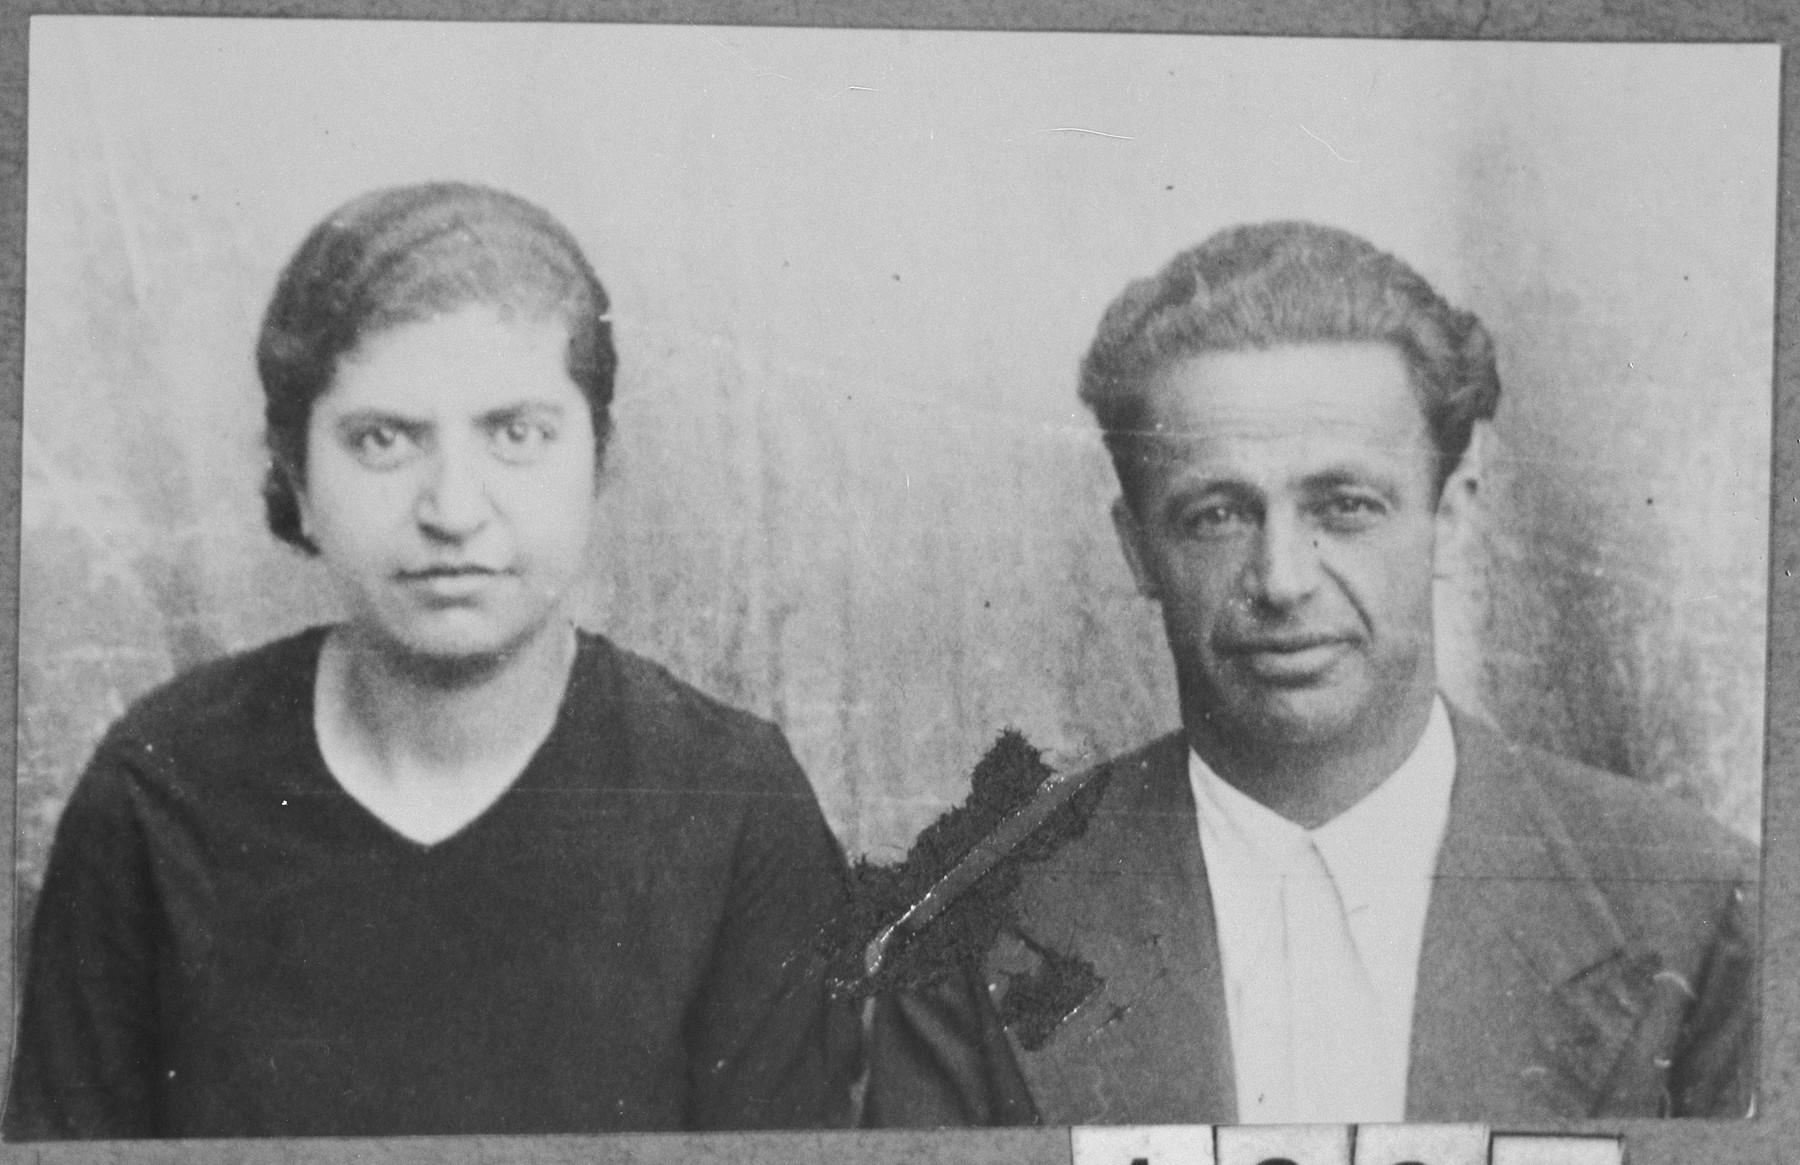 Portrait of Rafael Faradji, son of Mushon Faradji, and Rafael's wife, Mari.  Rafael and Mari were laborers.  They lived at Dr. Raisa 134 in Bitola.